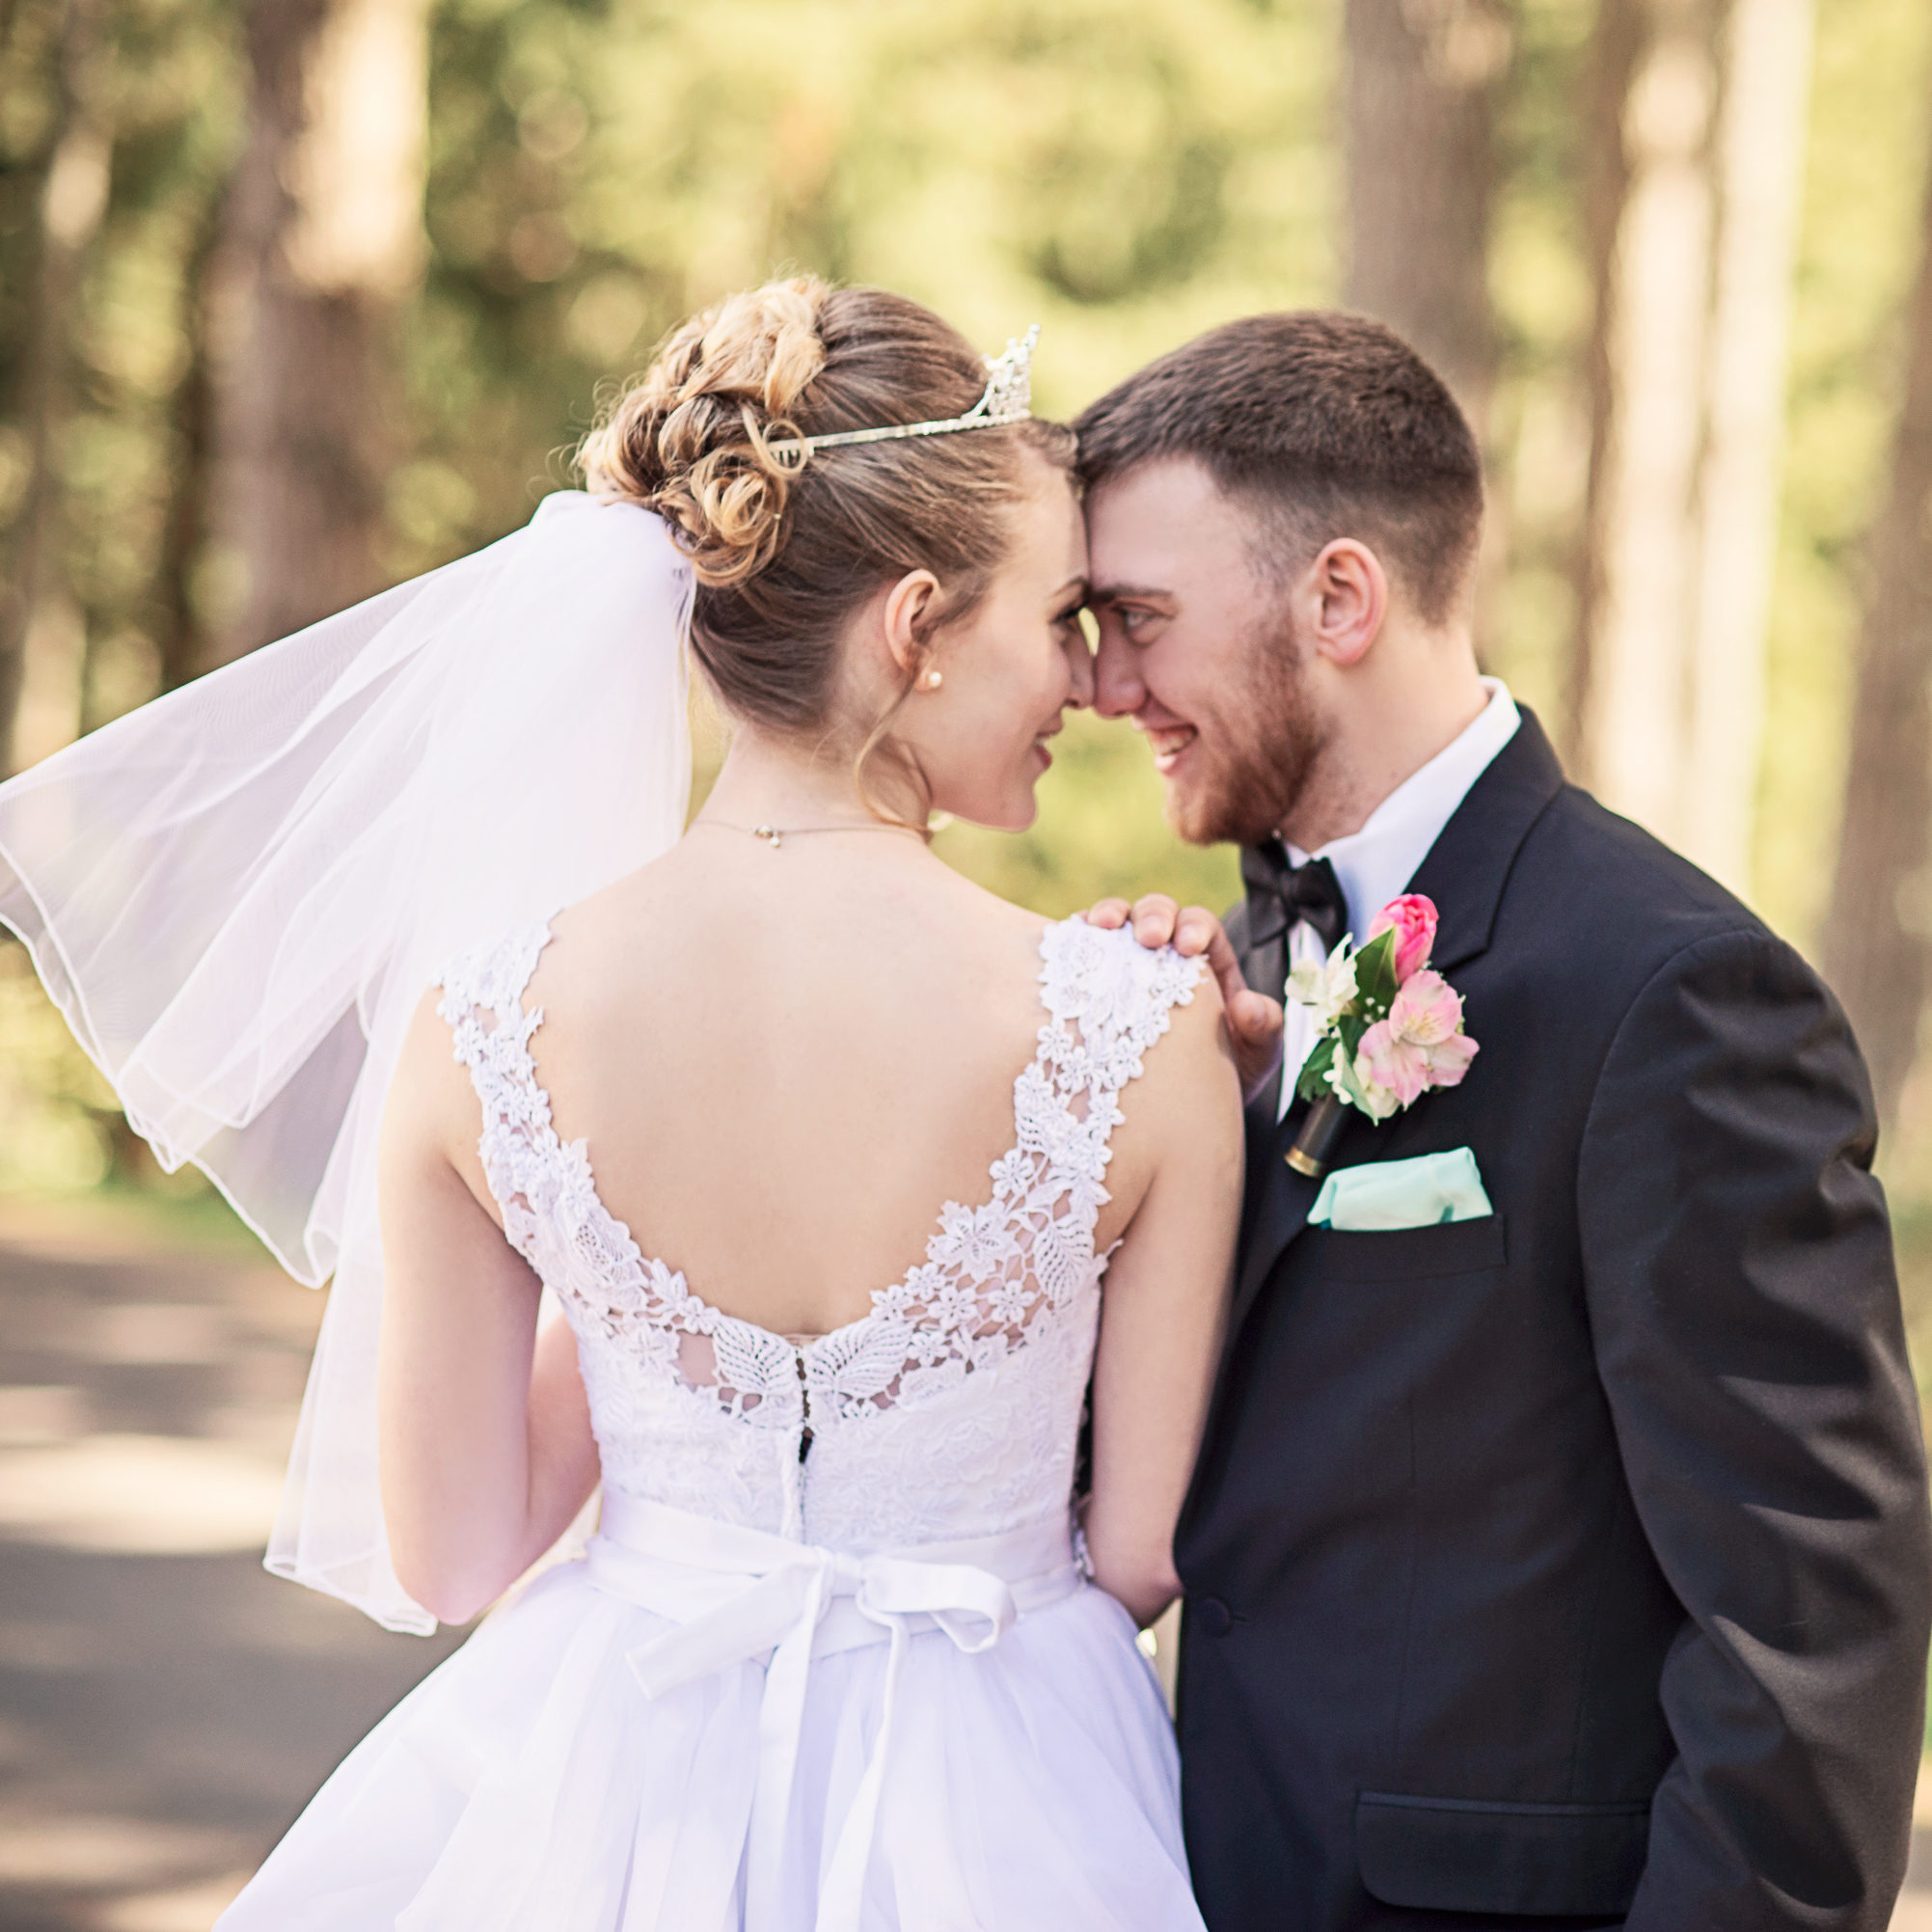 Fairytale Wedding_Seattle Wedding Photographer_Kelsey Lane Photography_4